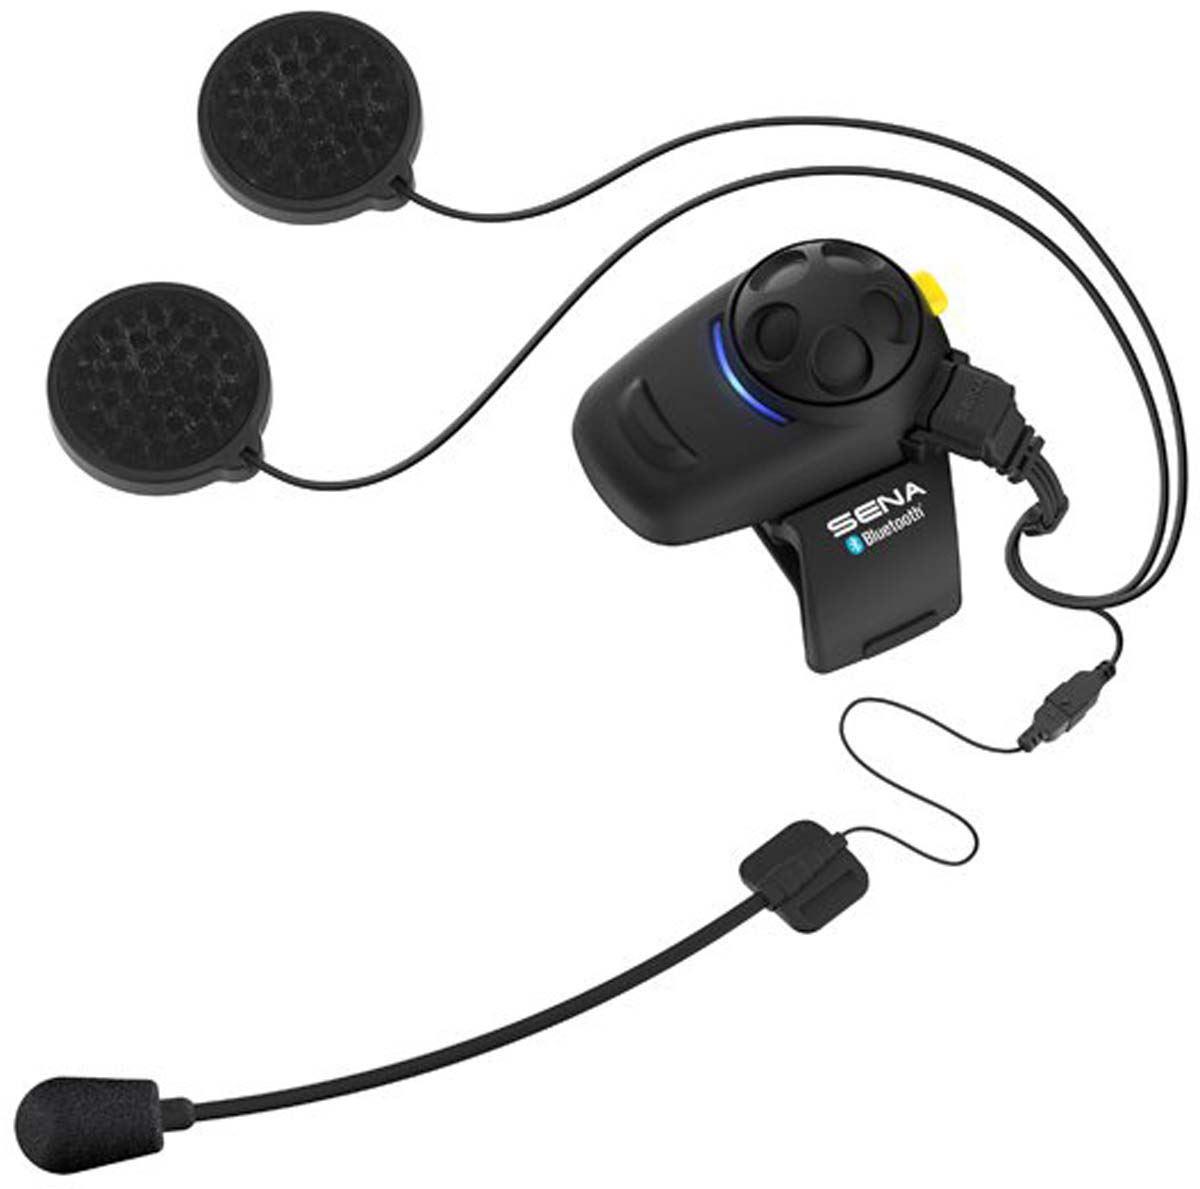 sena smh5 fm motorcycle bluetooth headset intercom with fm tuner single dual ebay. Black Bedroom Furniture Sets. Home Design Ideas